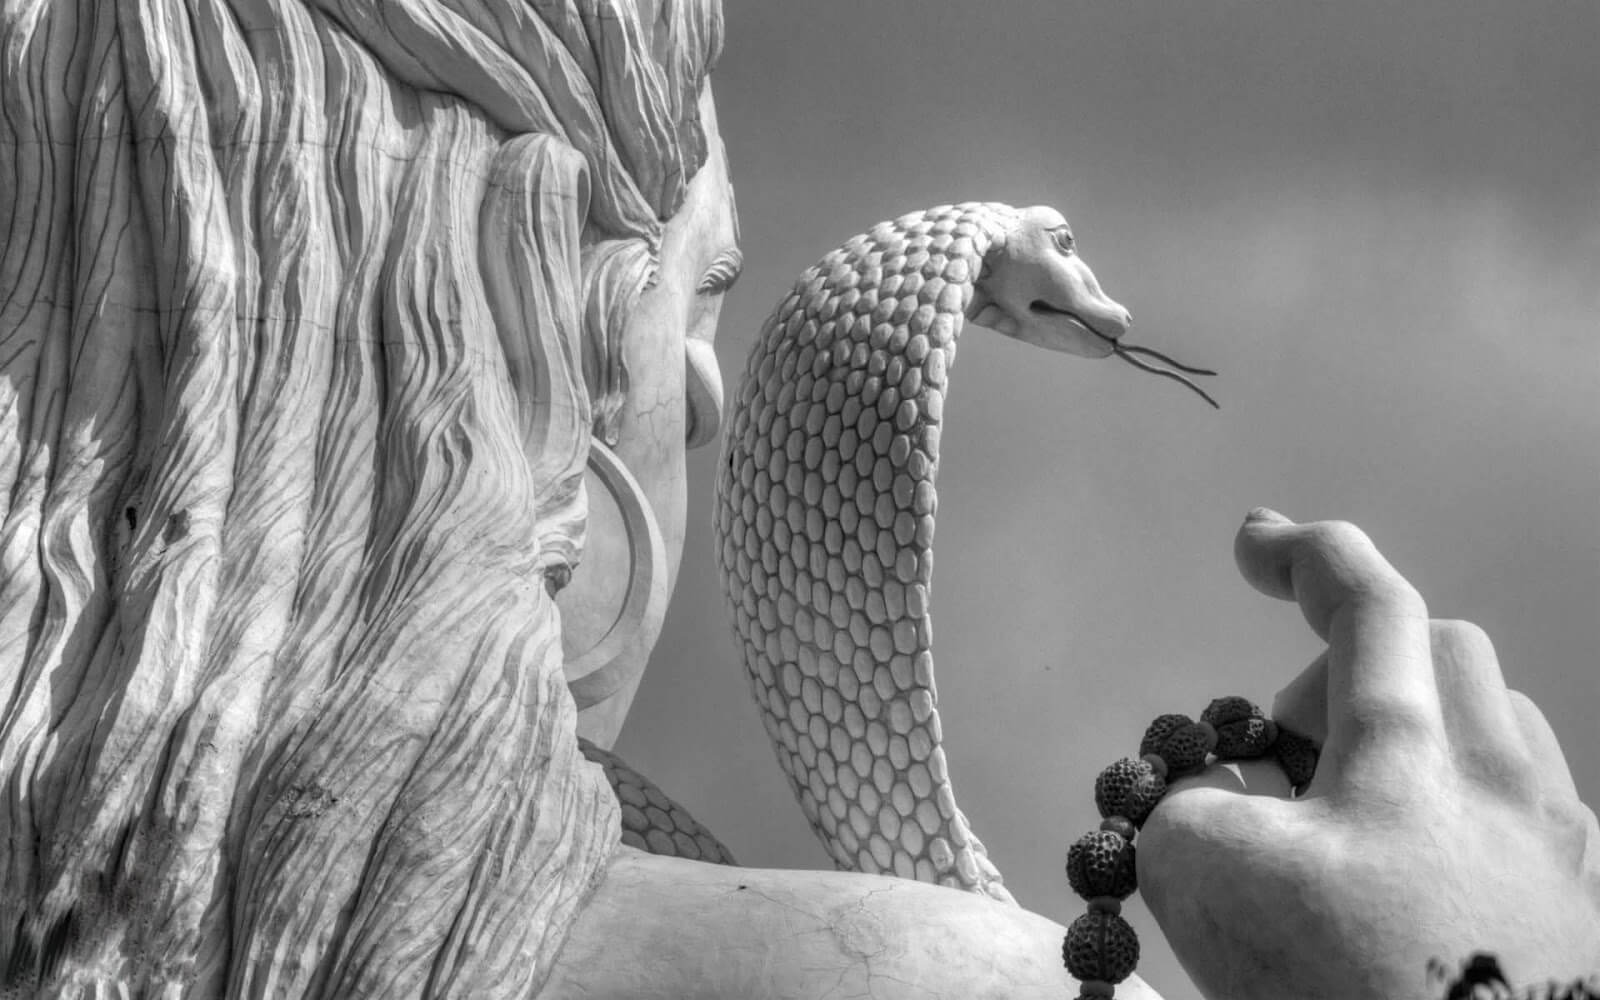 Jayatvadabhravibhrama Bhramadbhujangamasafur रावण रचित शिव तांडव स्तोत्र बोल और अर्थ Shiv Tandav Lyrics And Meaning Made By Ravan (9)